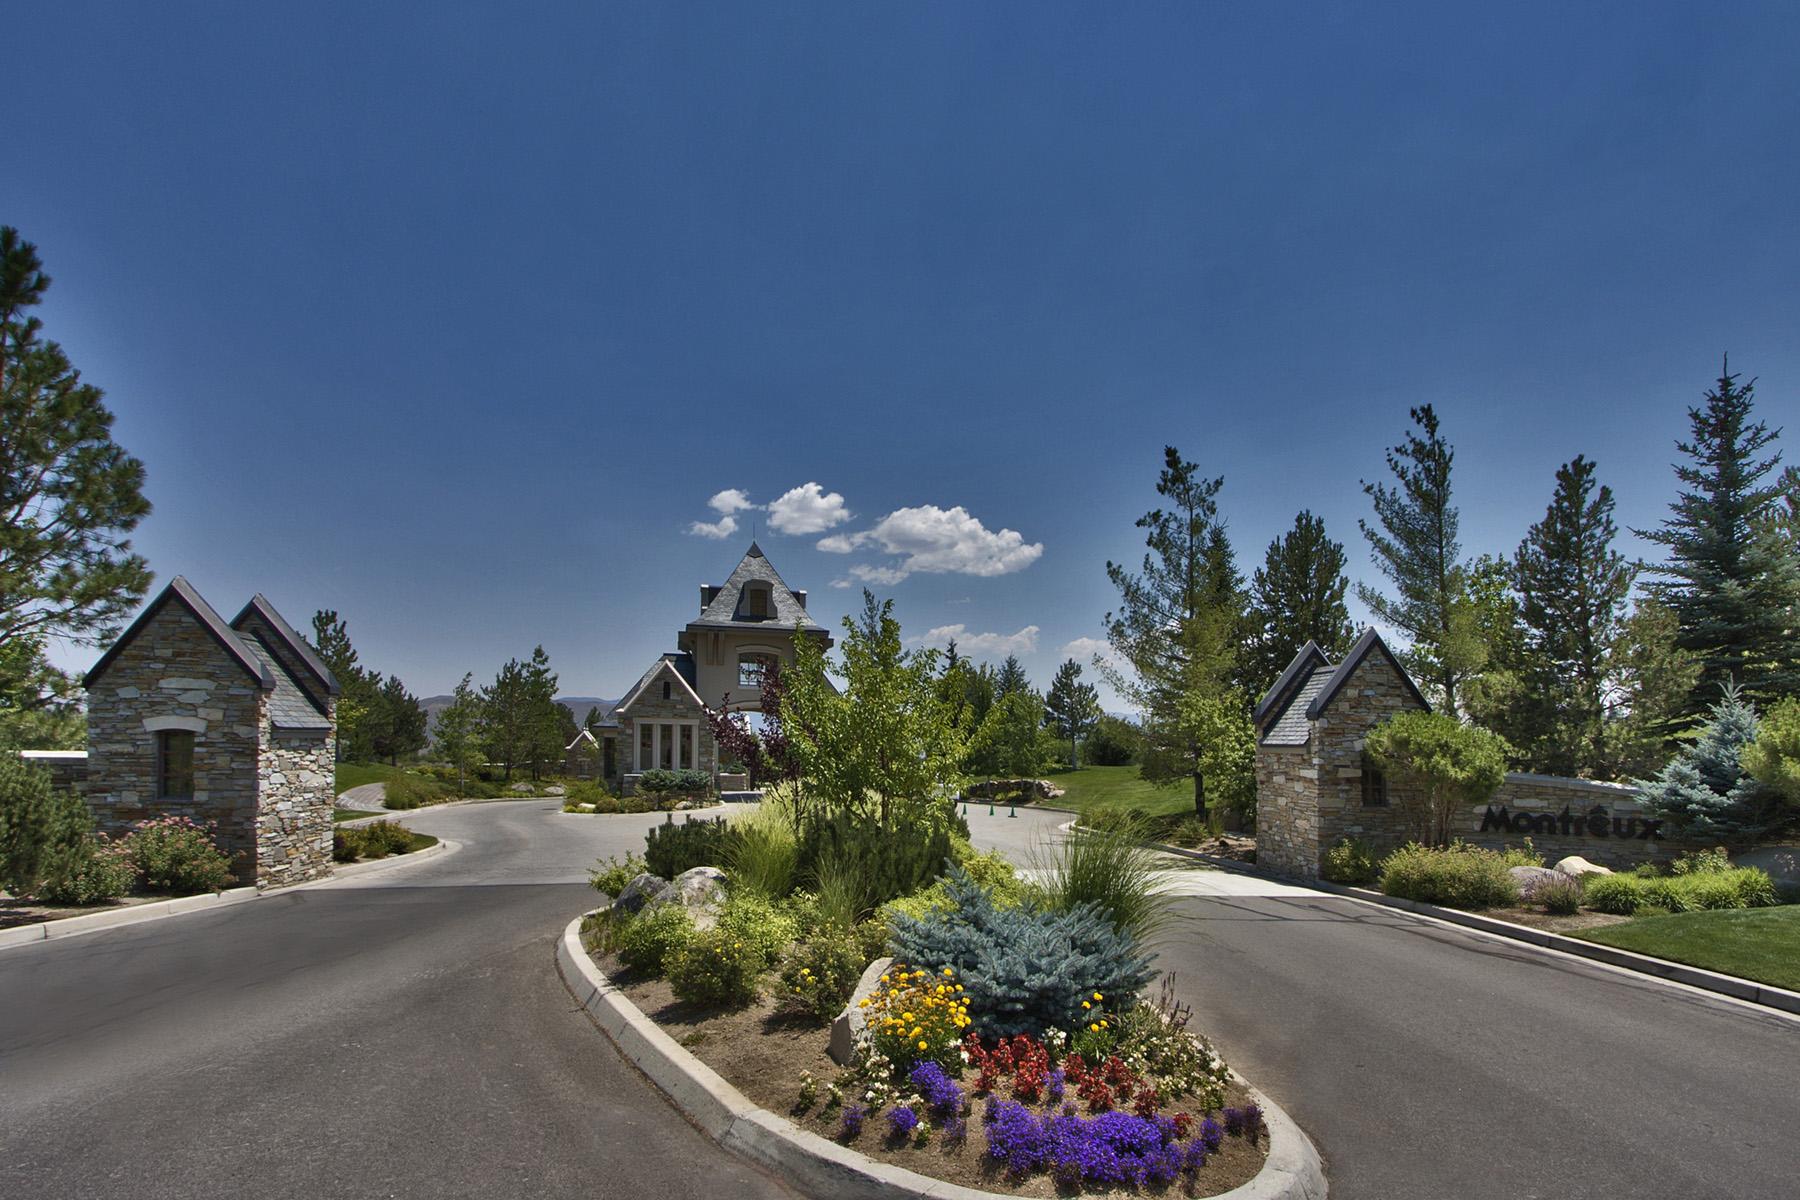 Land for Sale at 5102 Nestle Court Reno, Nevada, 89511 Lake Tahoe, United States